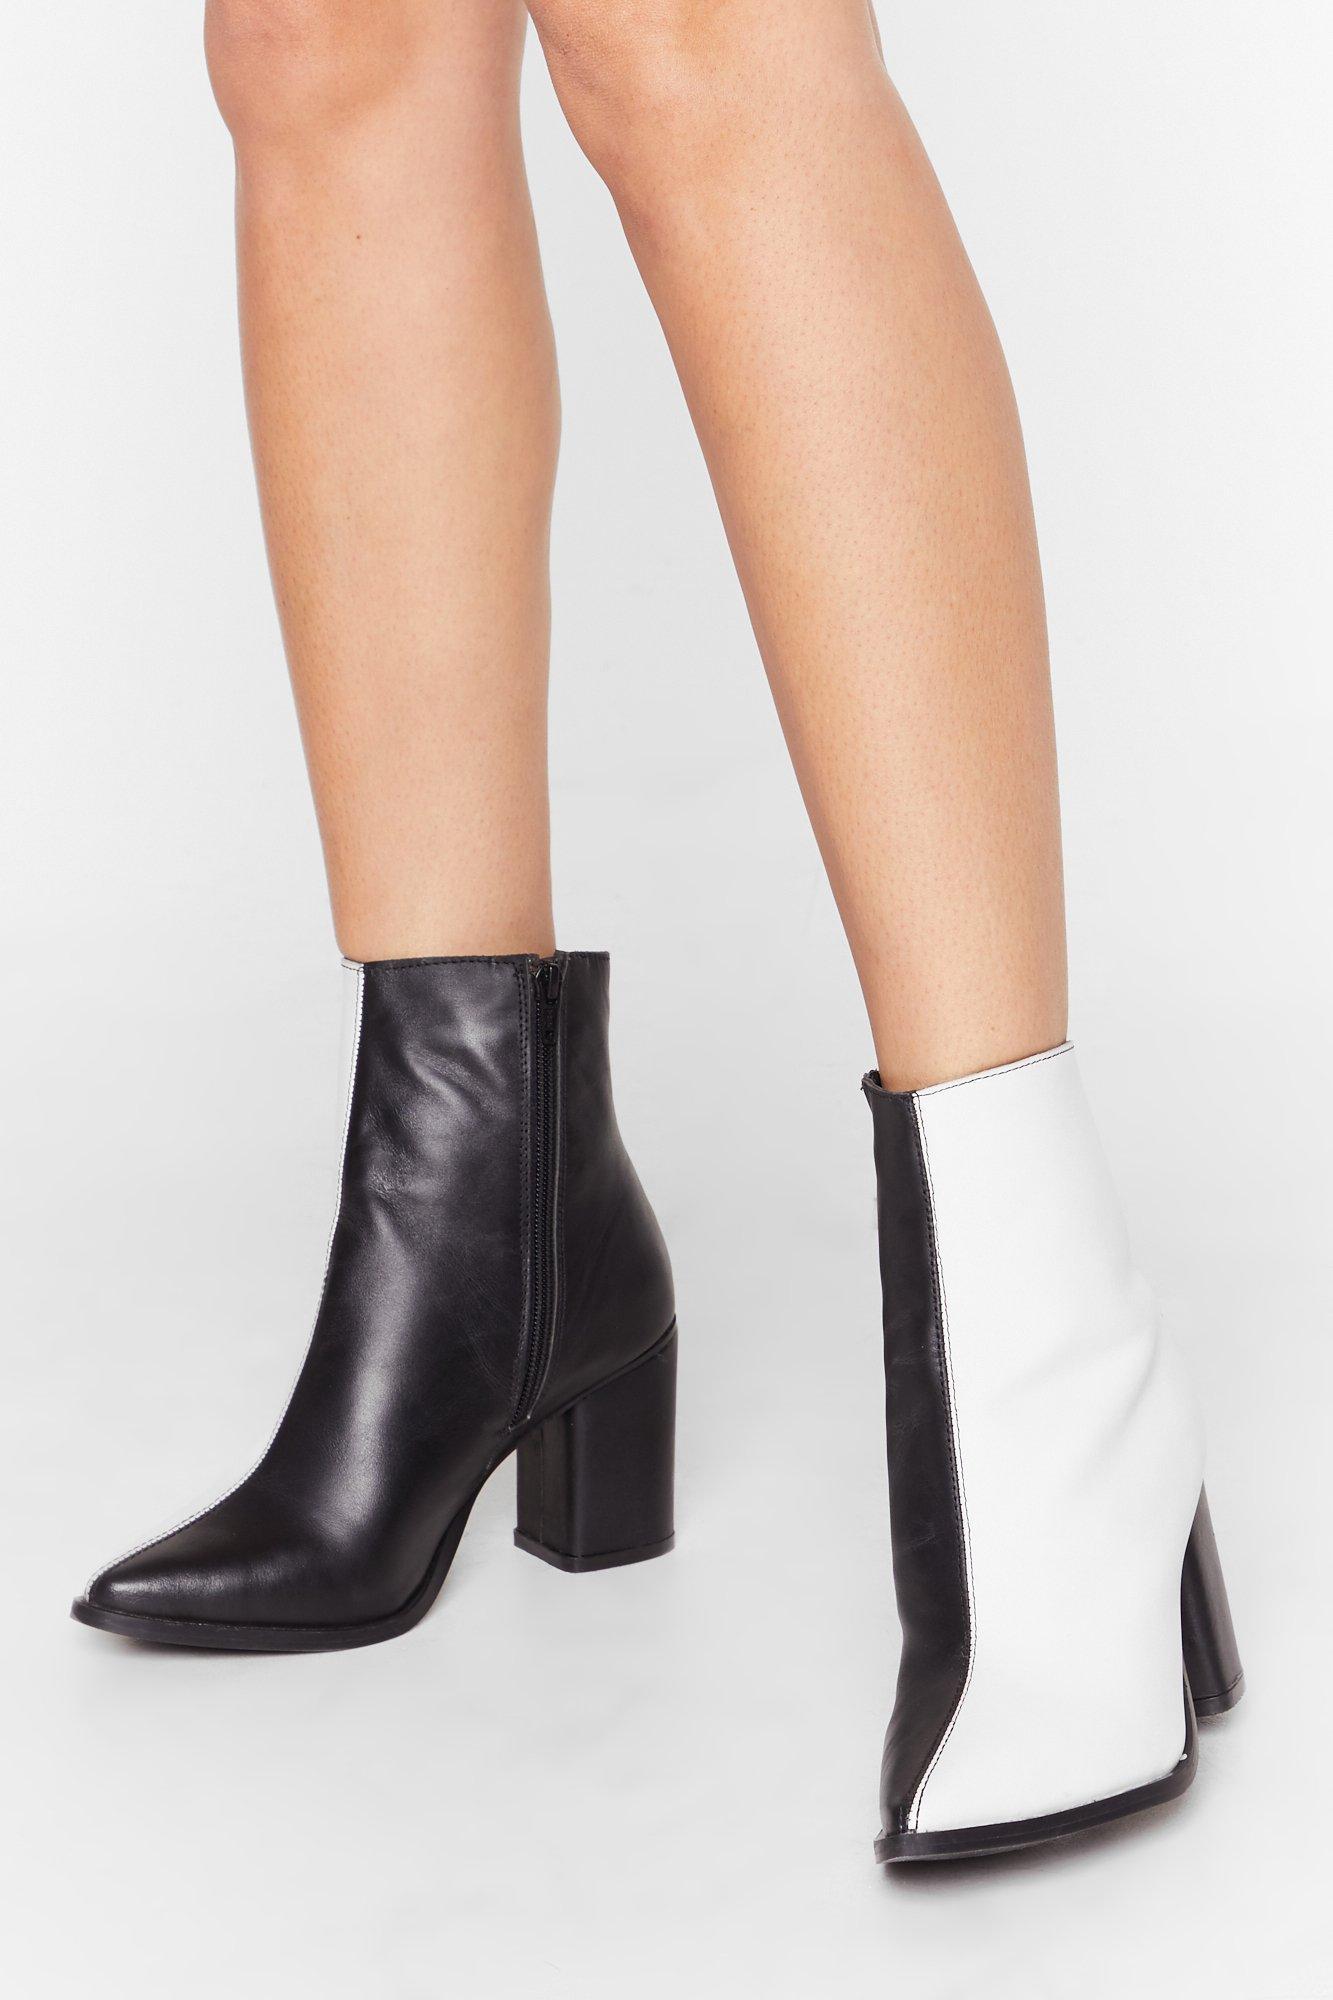 Image of Leather mono half & half boot block heel boot